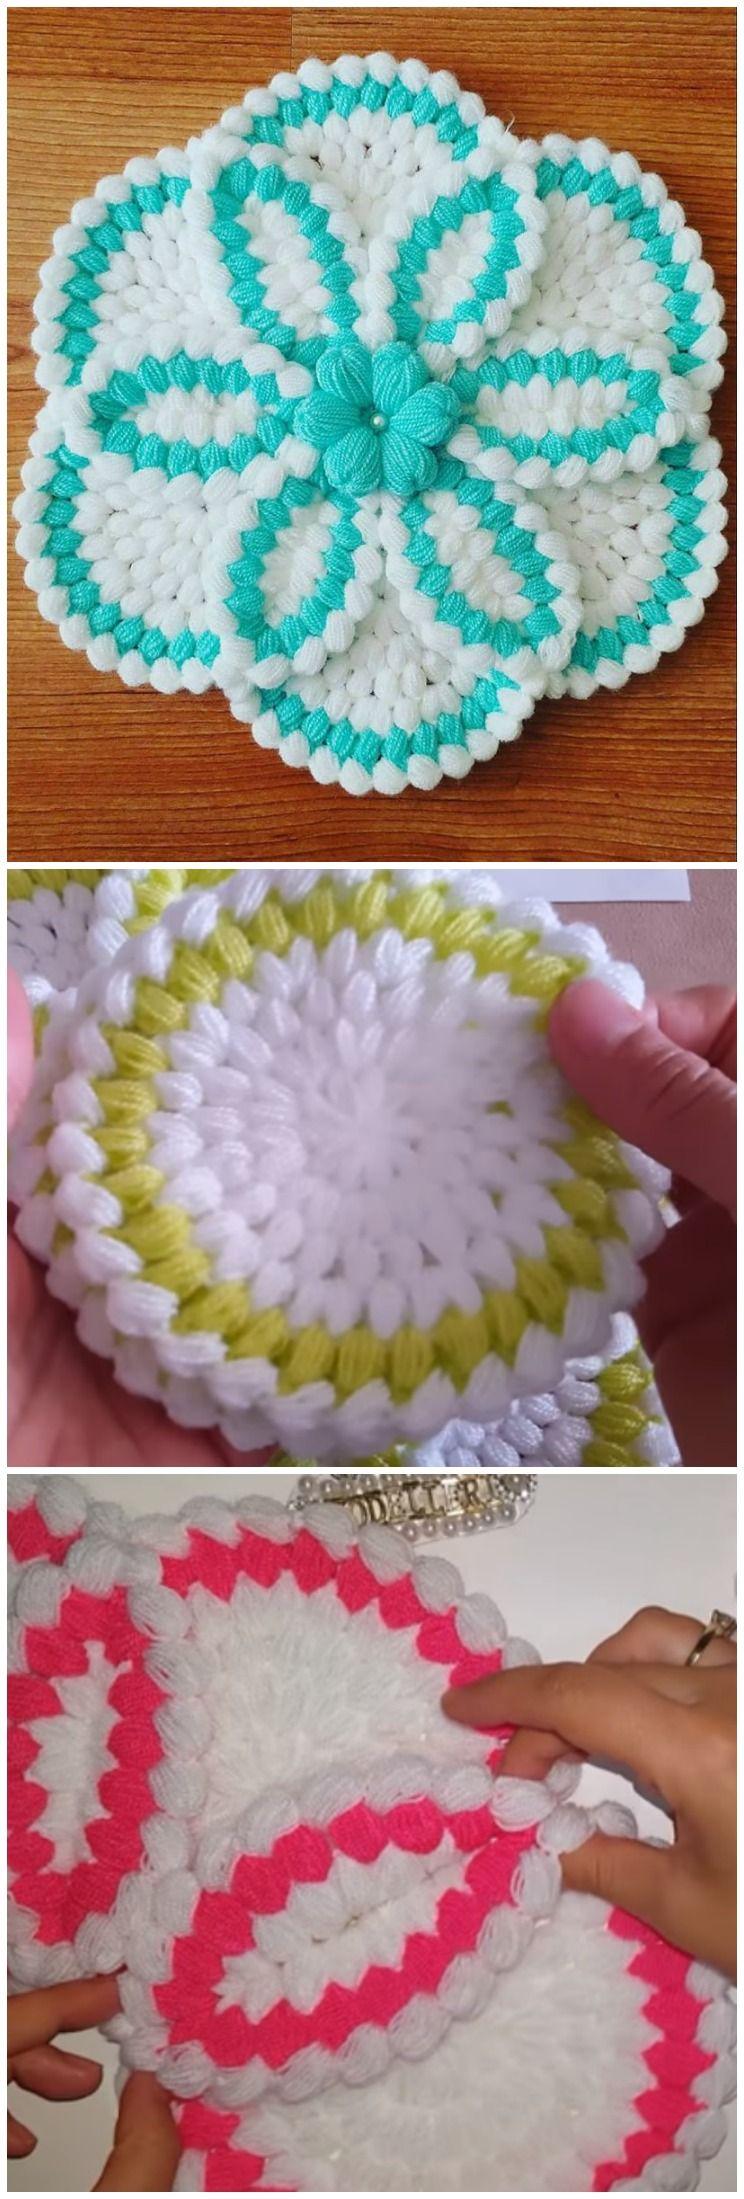 Crochet Beautiful Table Decorations | Tejido, Ganchillo y Carpeta